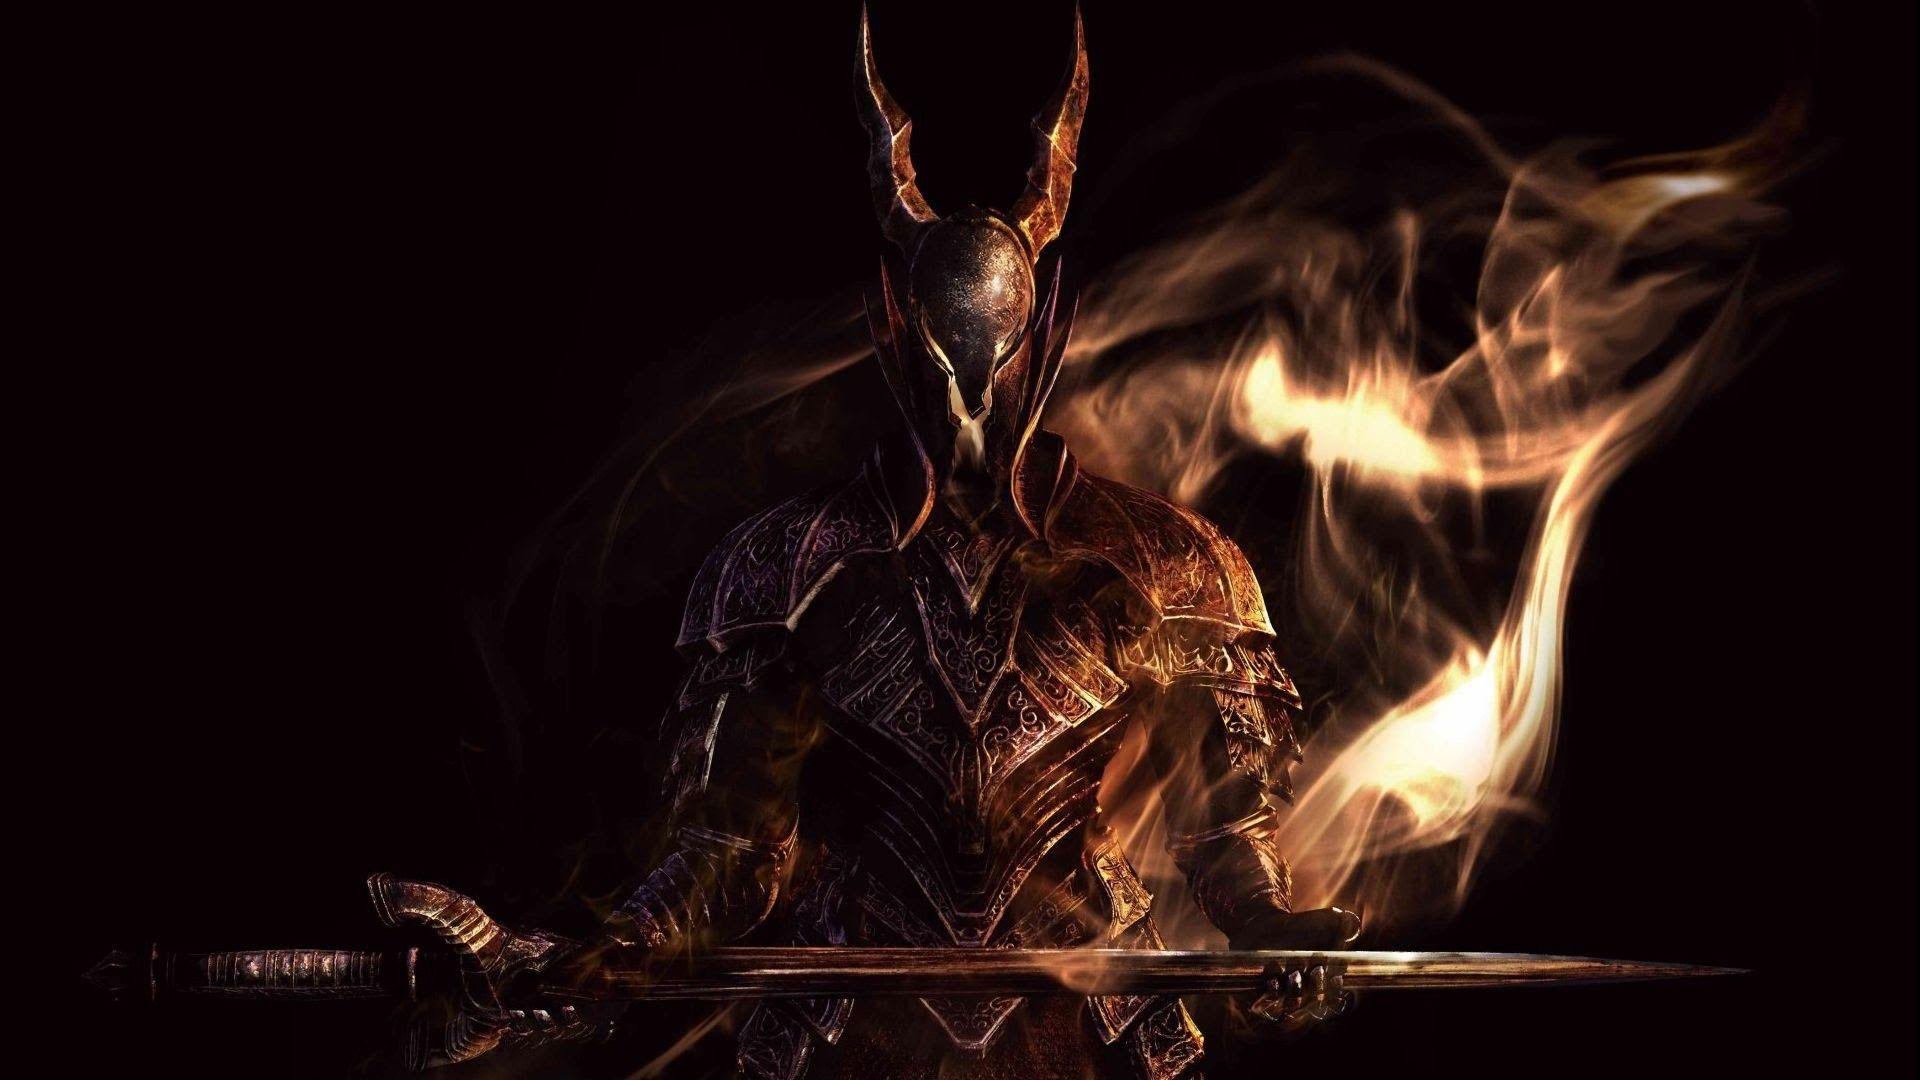 1920x1080 Dark Souls 3 Pc Sl 121 Invasions Pvp Black Knight Cosplay Youtube Dark Souls Wallpaper Dark Desktop Backgrounds Dark Souls